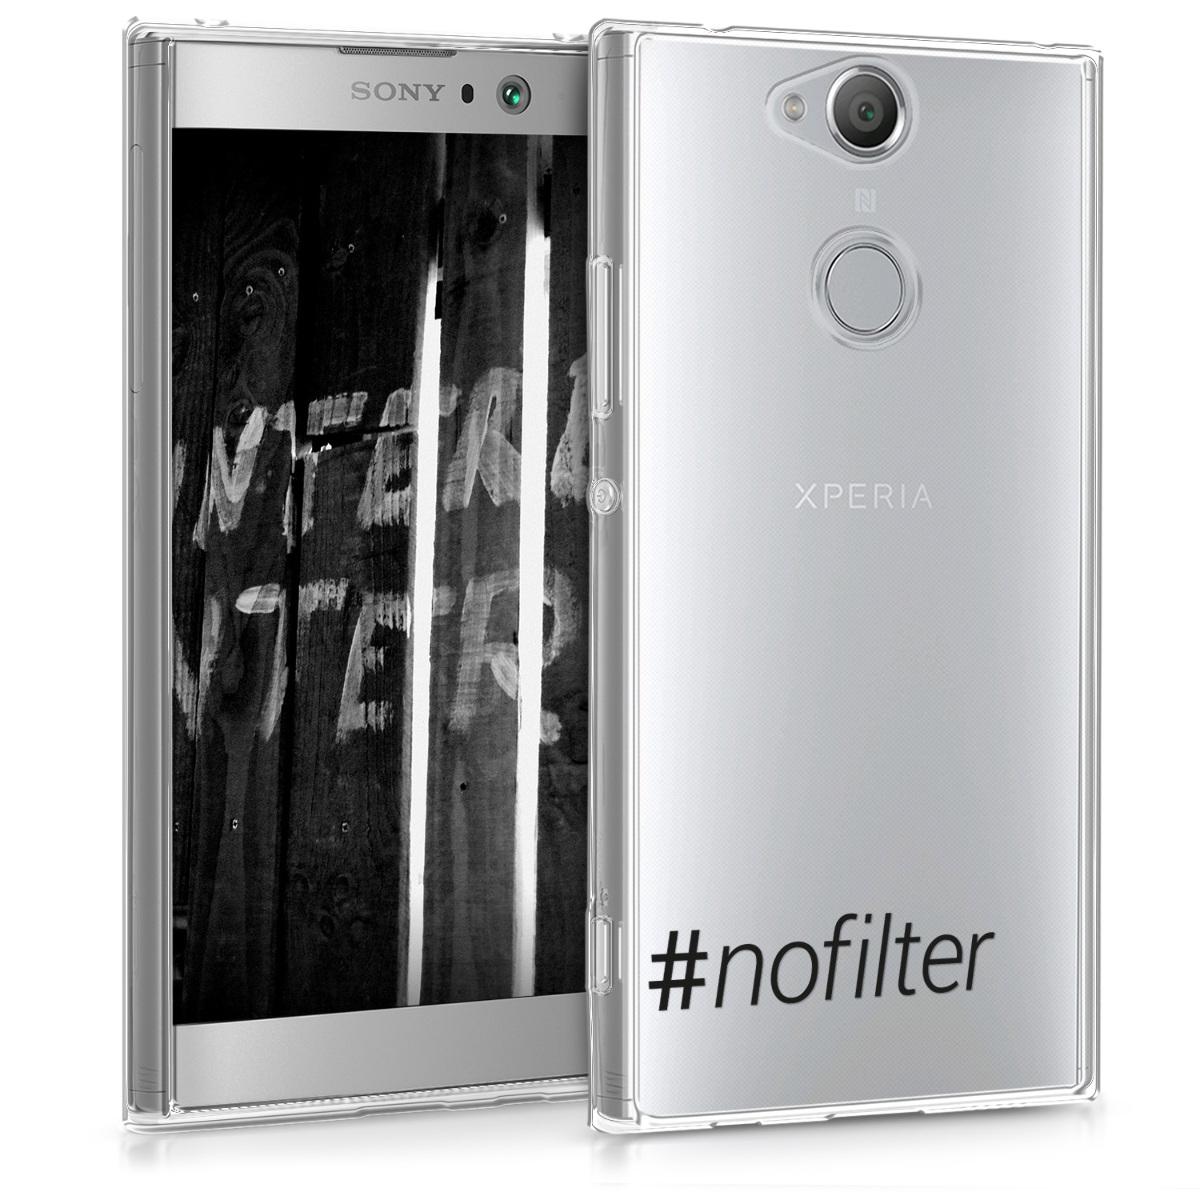 Kvalitní silikonové TPU pouzdro | obal pro Sony Xperia XA2 - Hashtag NoFilter černé / průhledné